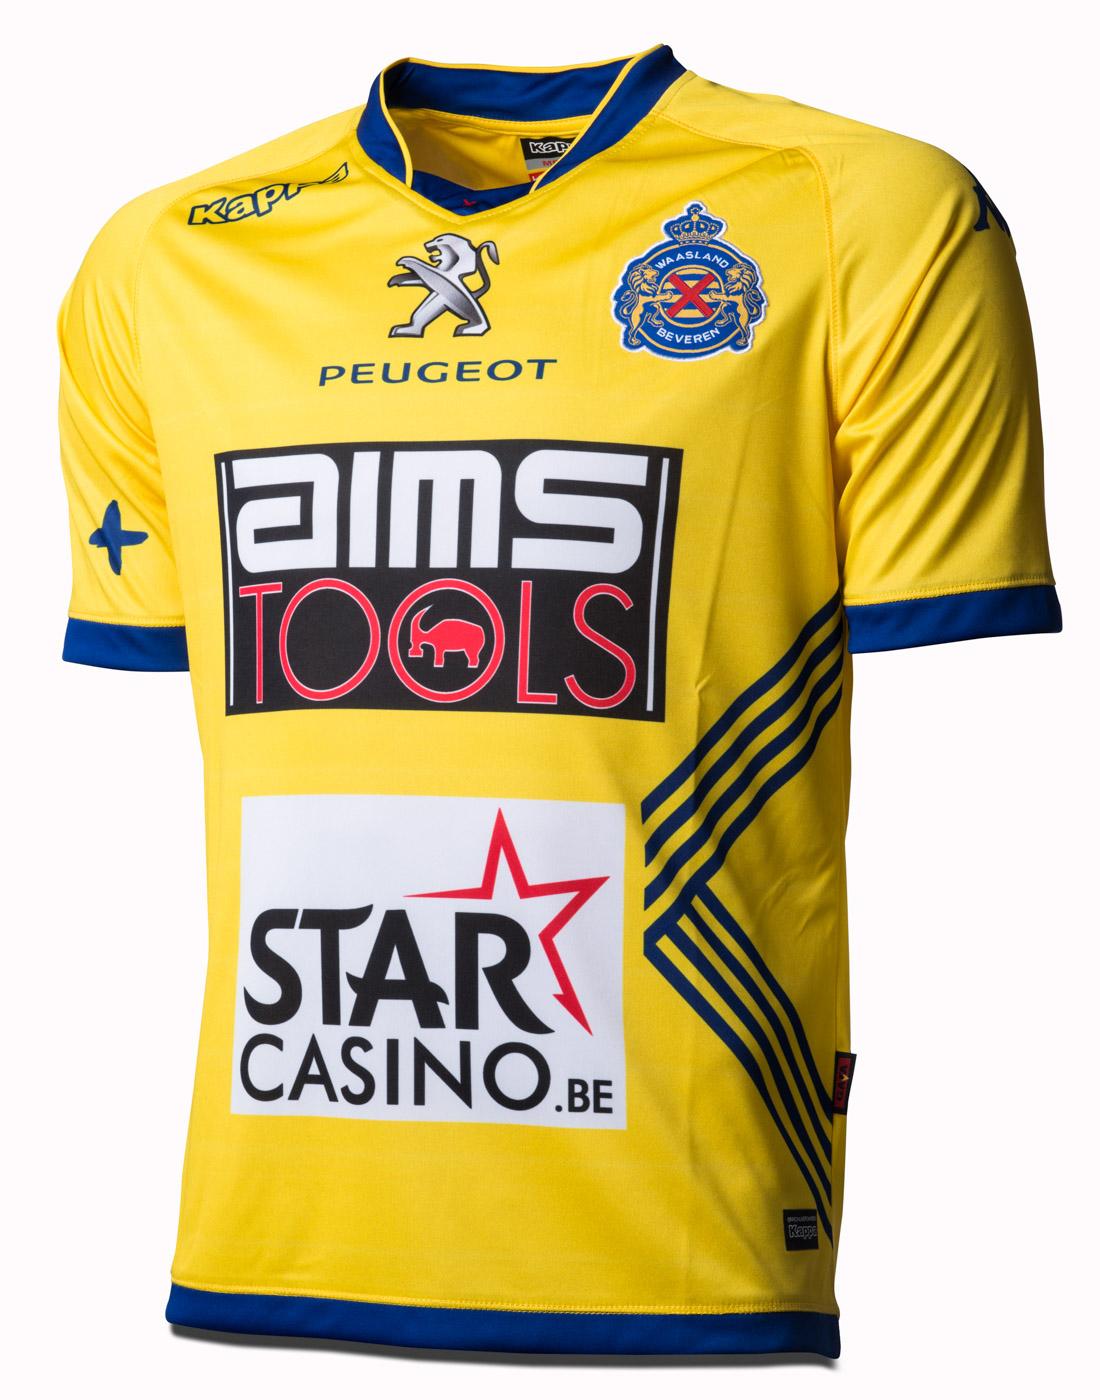 gokbedrijven sponsor voetbalclub